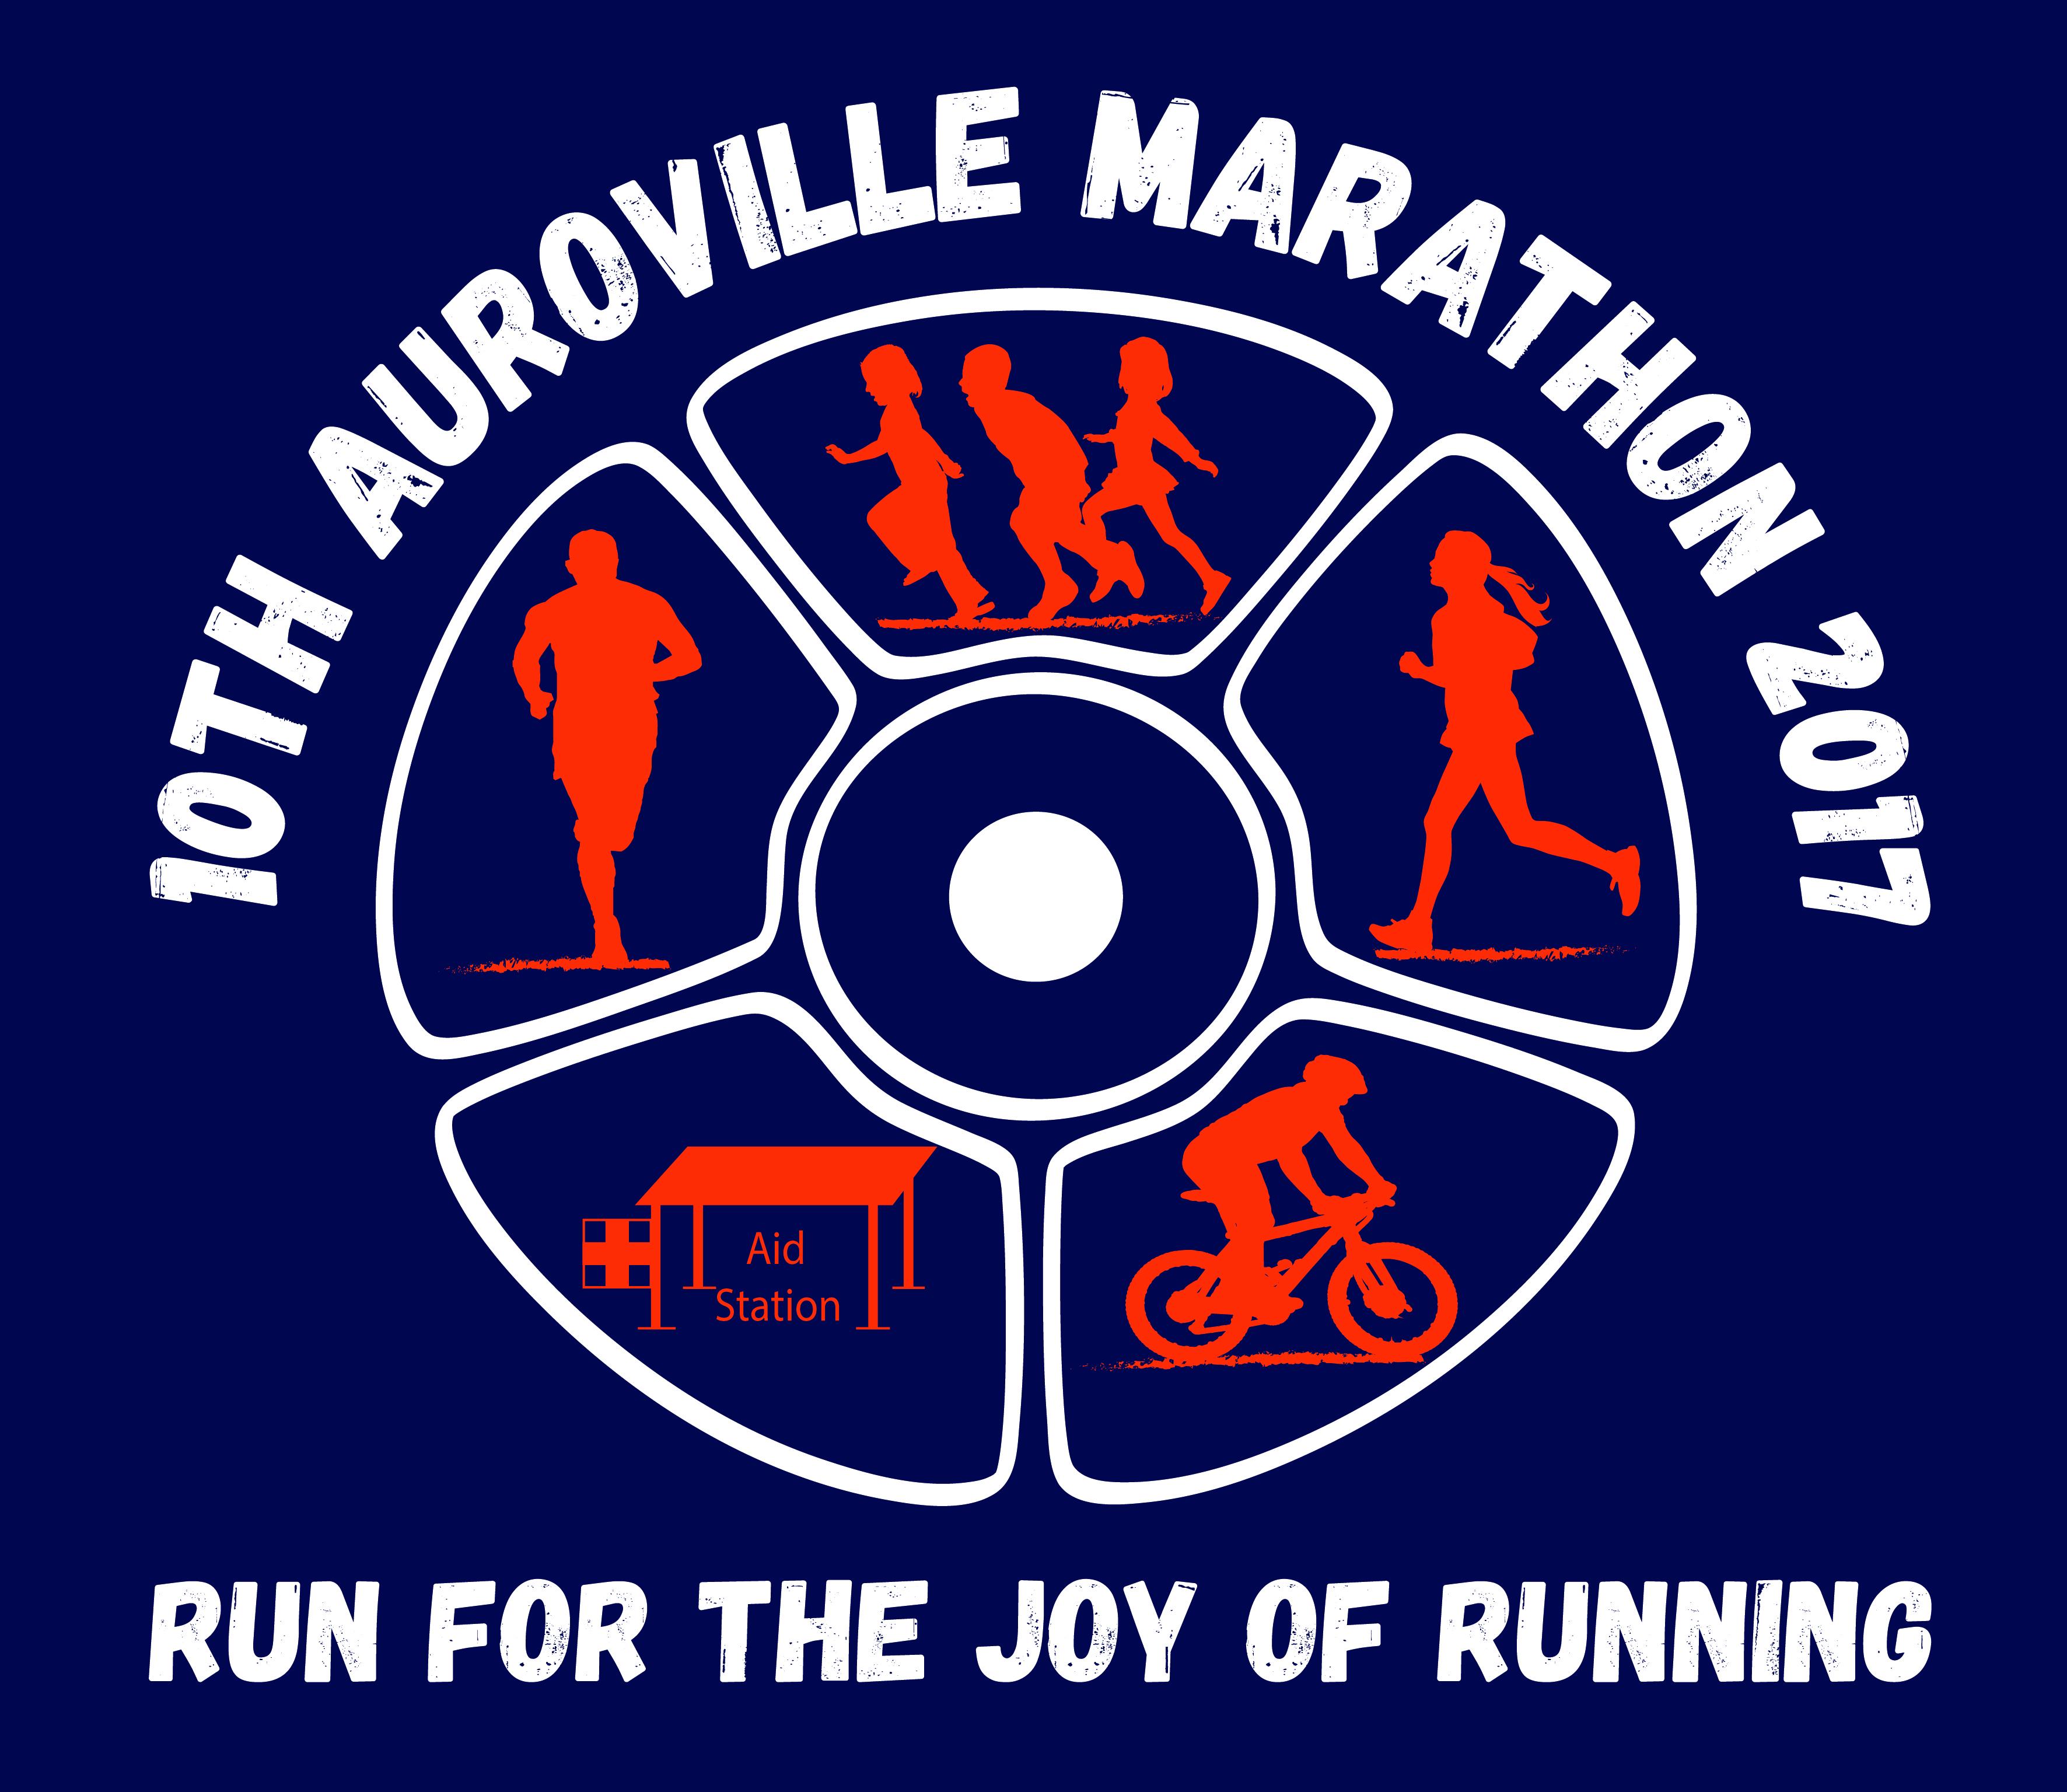 10th Marathon